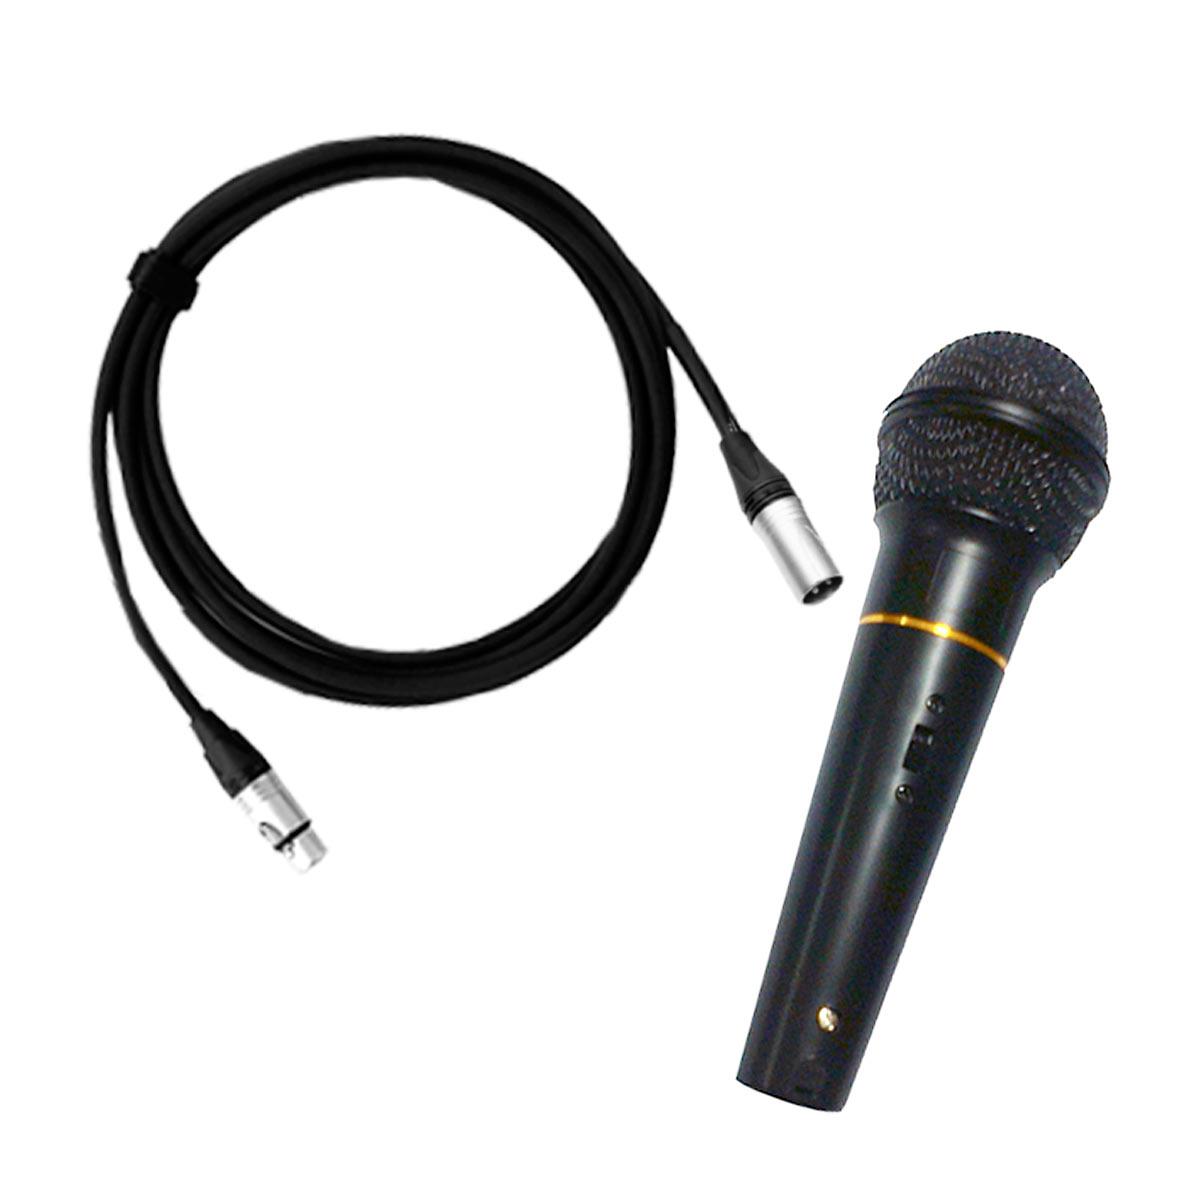 EVO410 - Kit Portátil c/ Mesa, 2 Caixas, Microfone e Cabo EVO 410 - Novik Neo